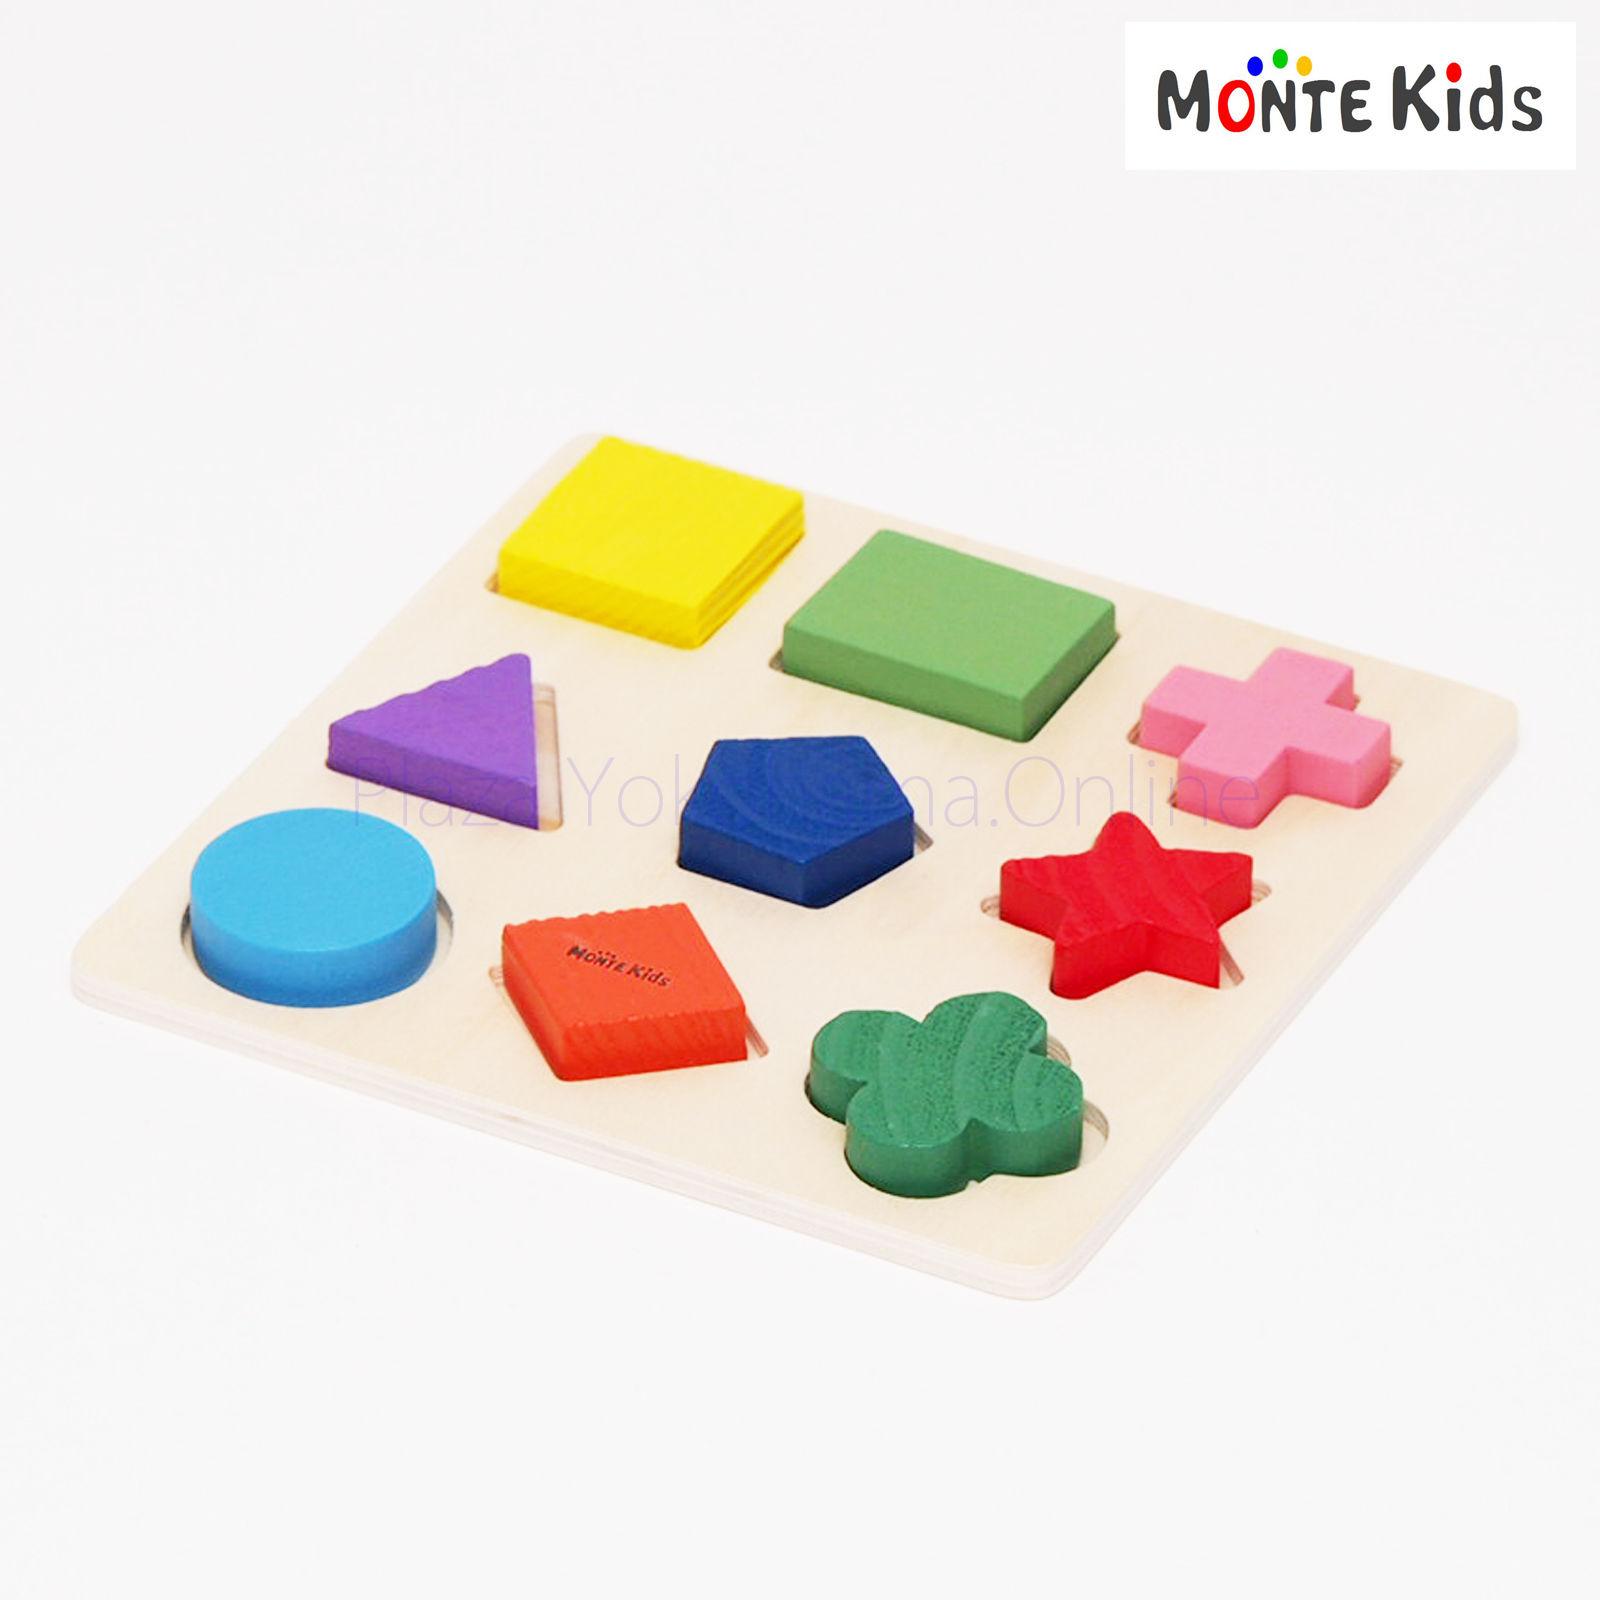 【MONTE Kids】MK-013  図形パズル A  ≪OUTLET≫